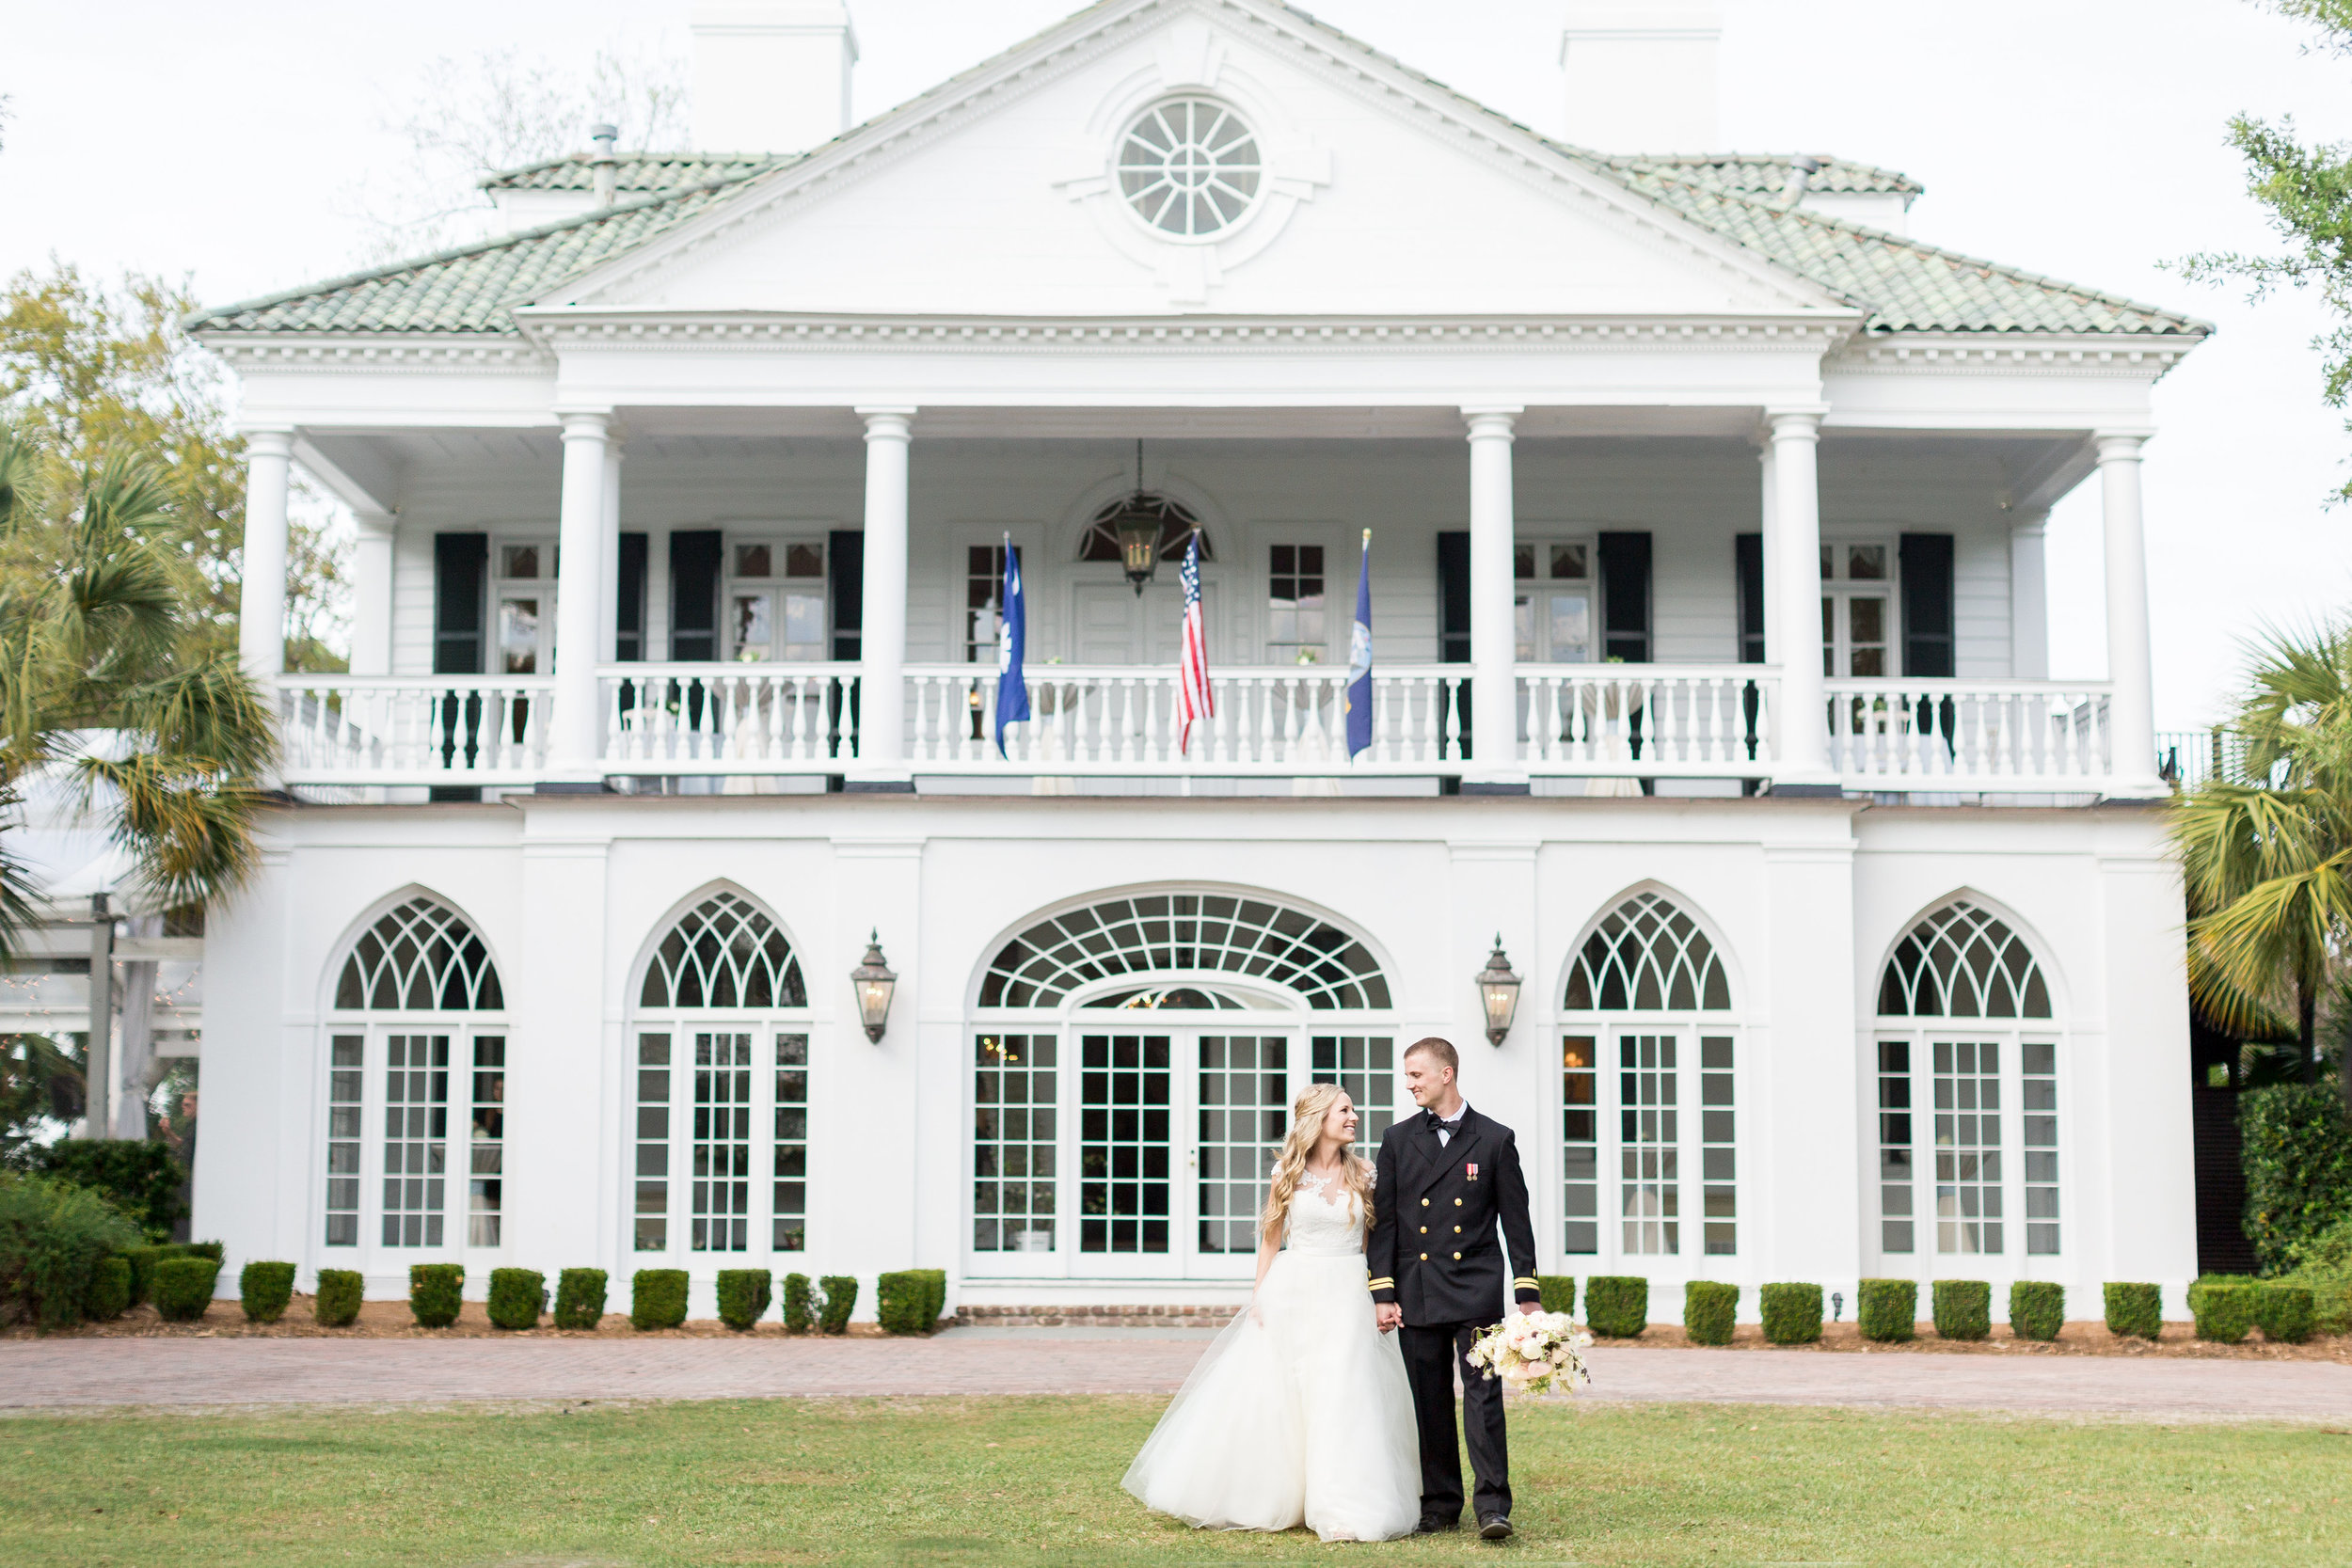 Shawn Lauren s Charleston Wedding-Bride and Groom Portraits-0115.jpg